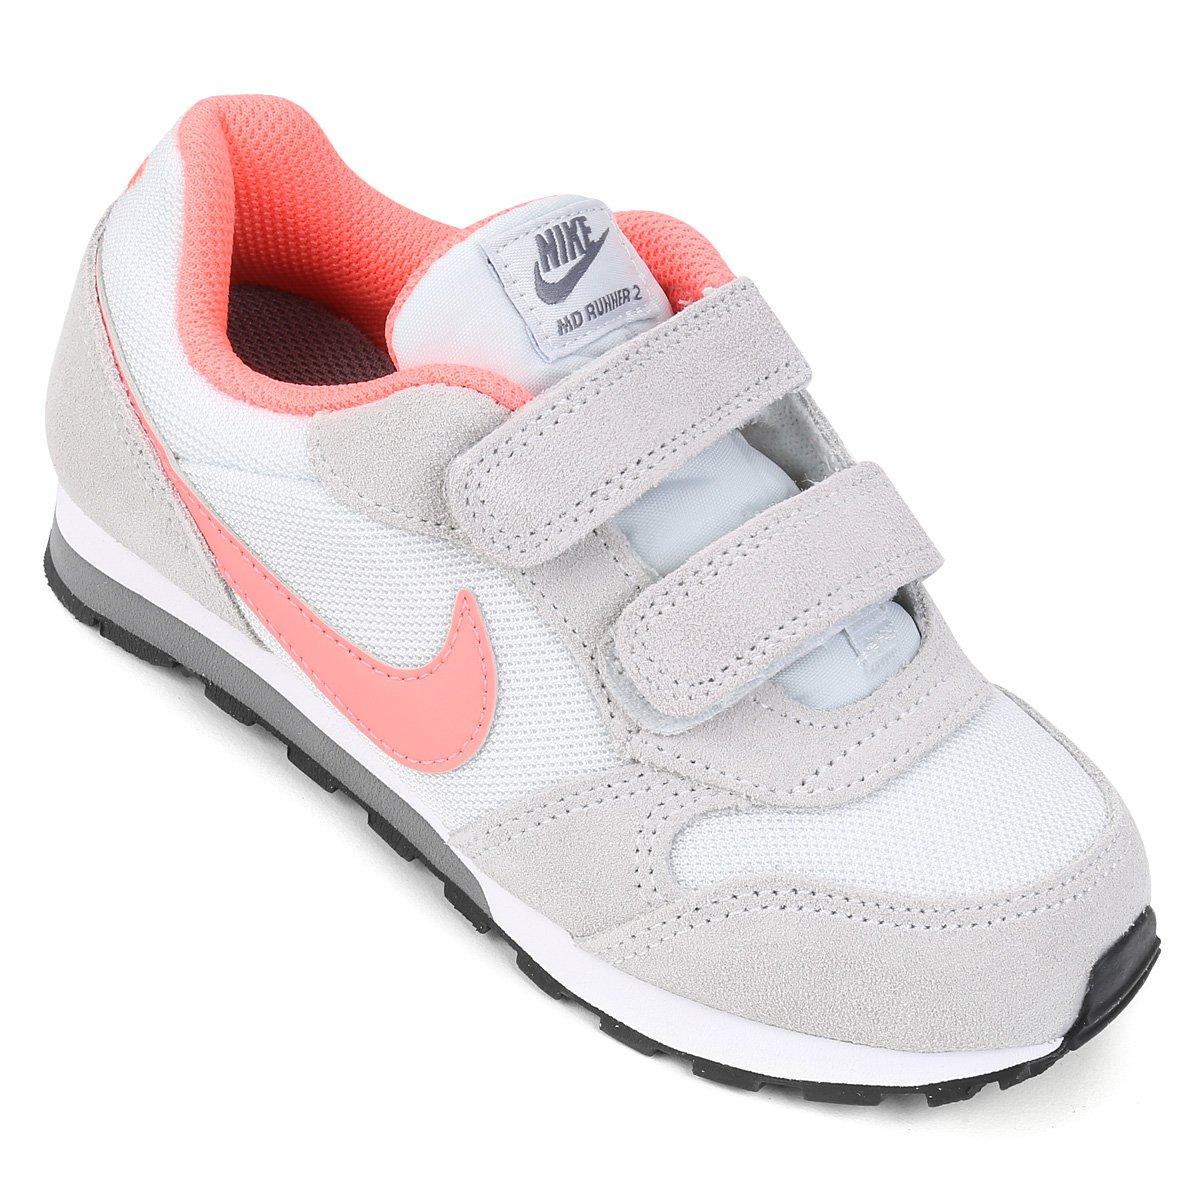 fe8319bb3a0 Tênis Infantil Nike Md Runner 2 Feminino - Branco e Rosa - Compre Agora